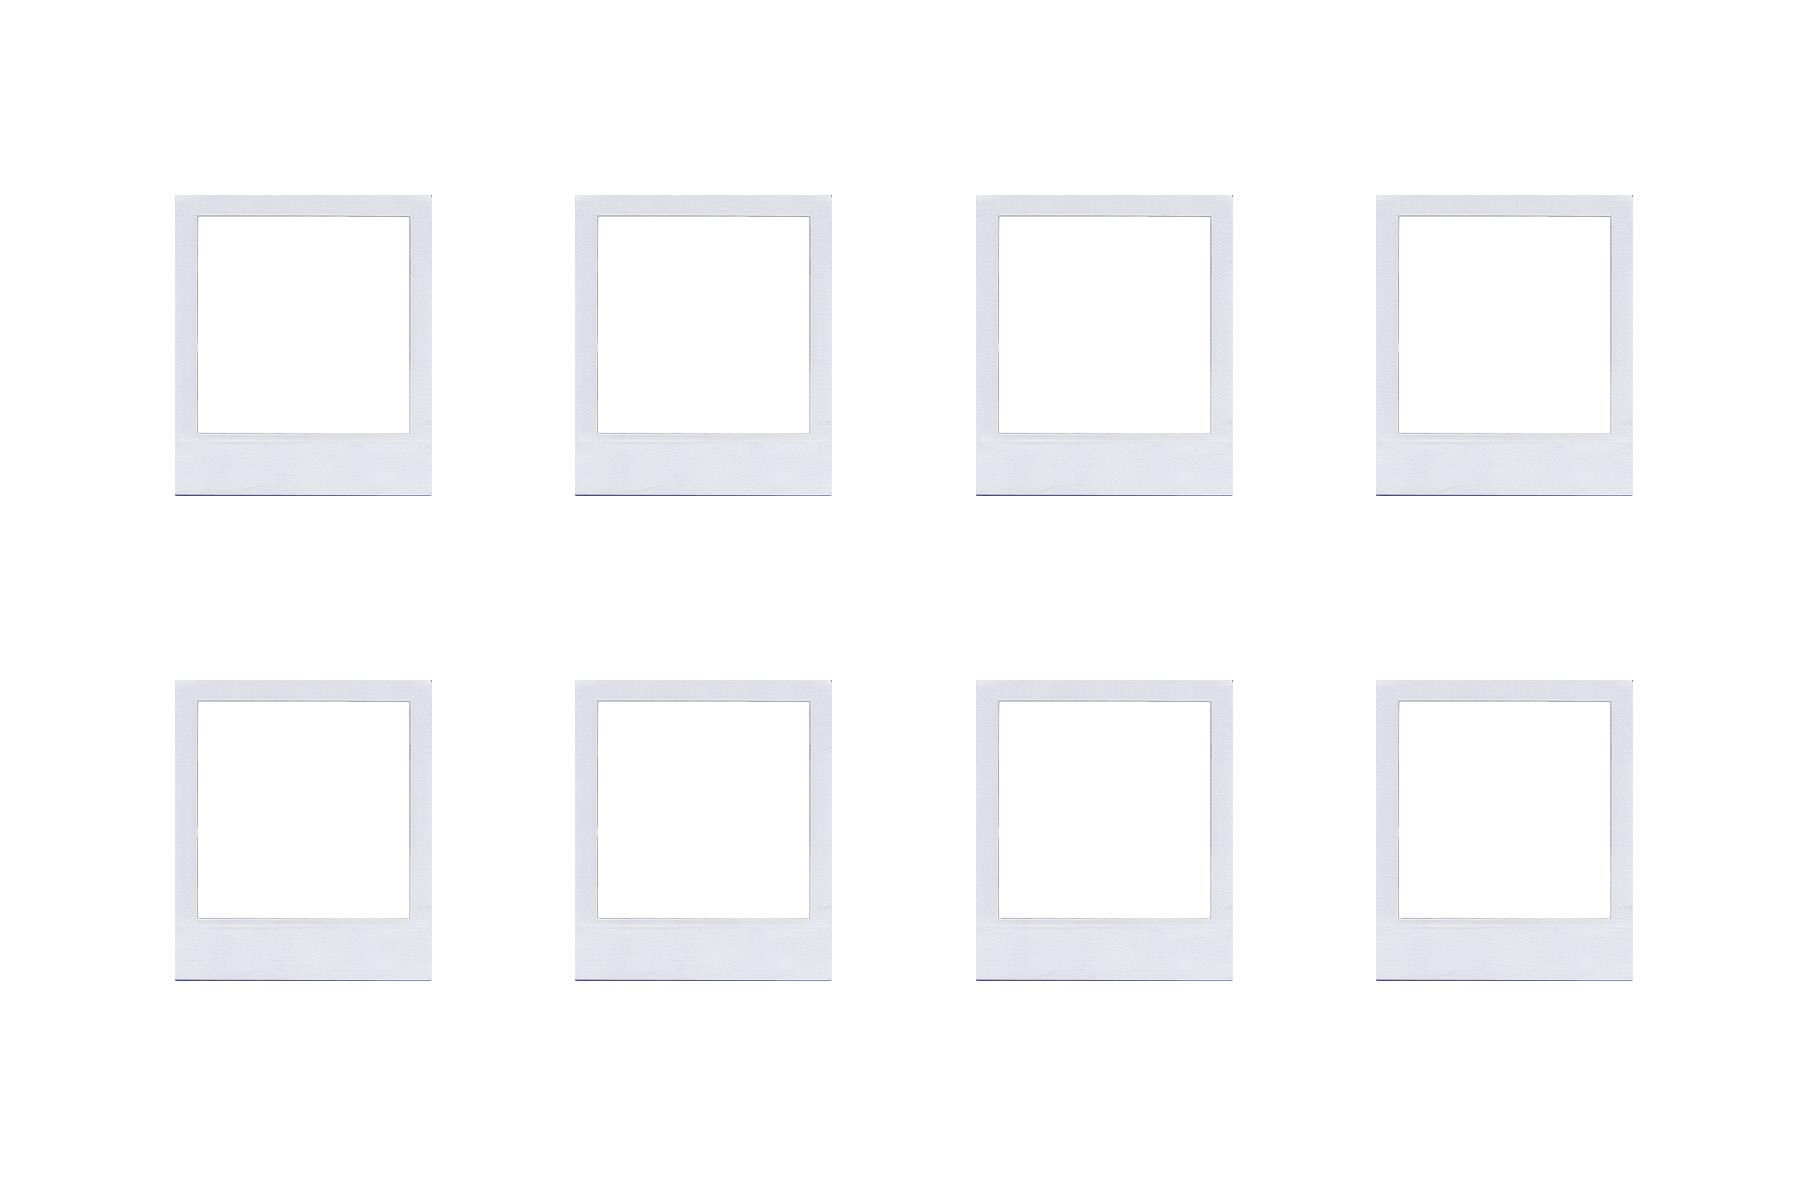 Preciosos imanes estilo polaroid - Guía de MANUALIDADES